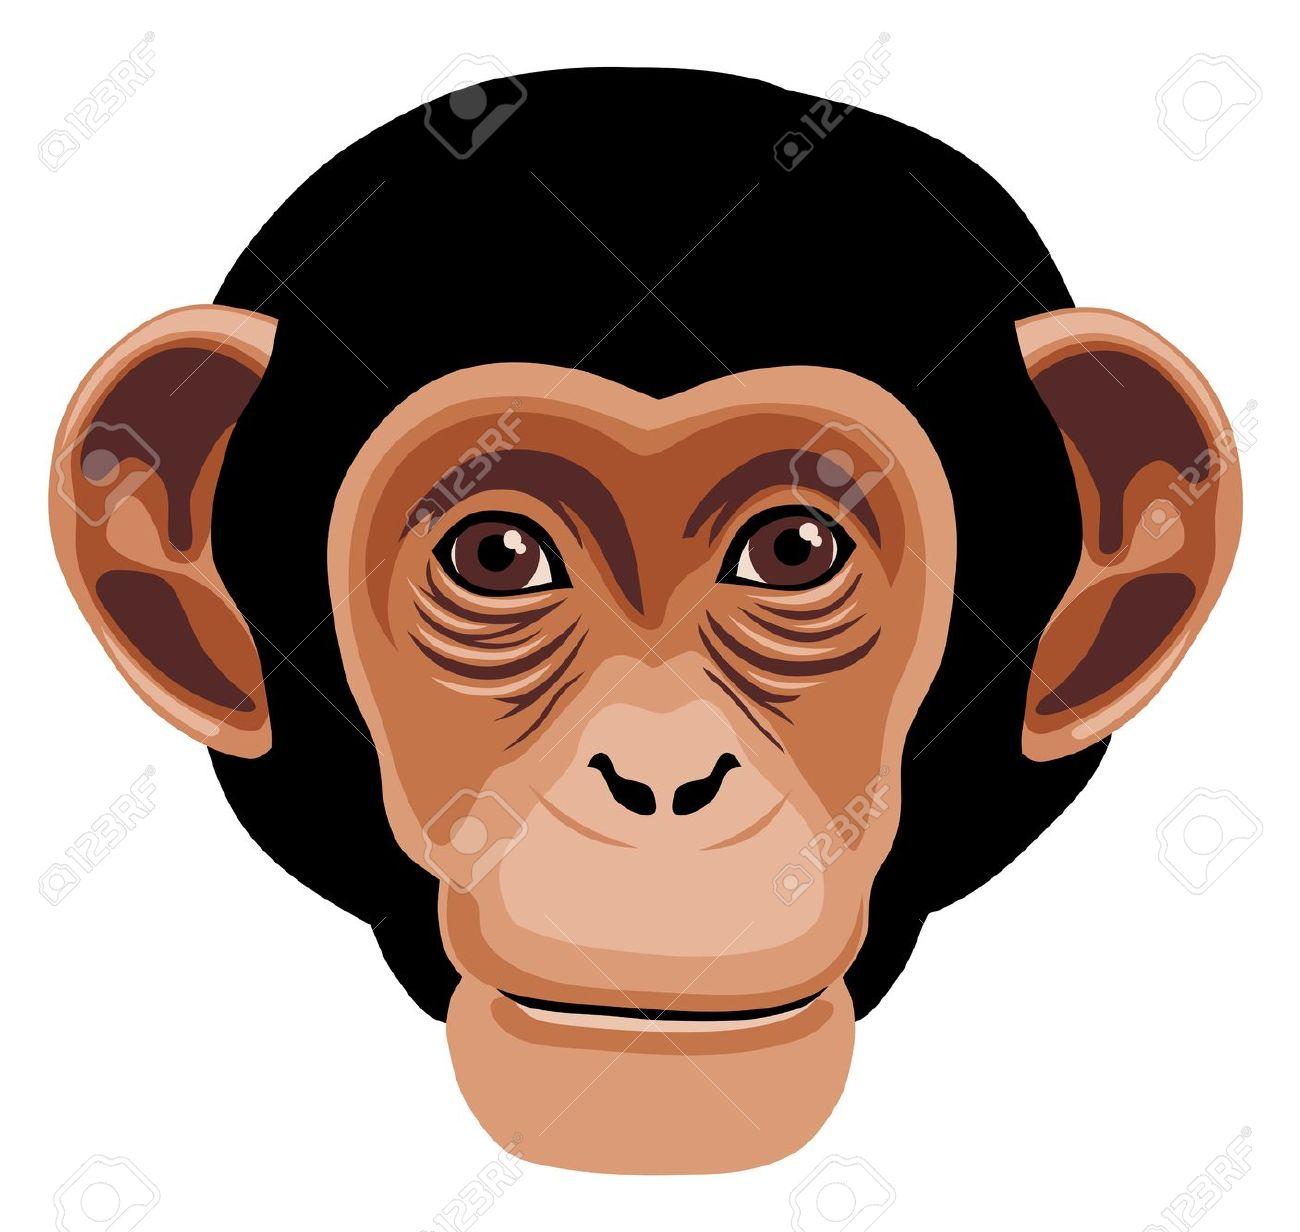 Bonobo clipart Clipart Chimpanzee 99 Top Clipart